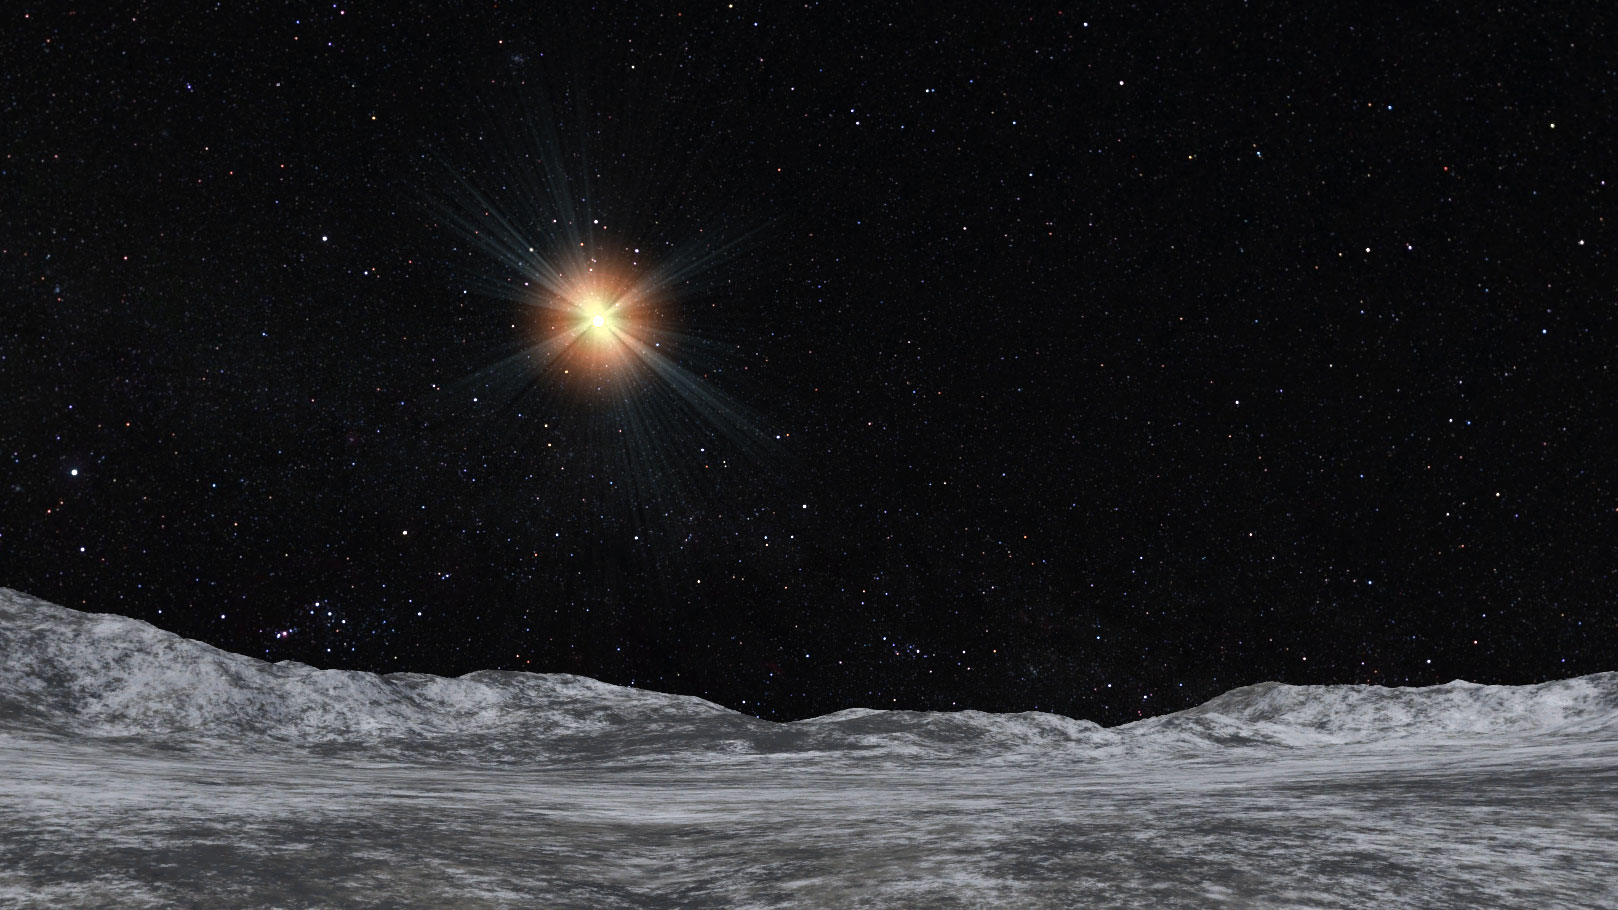 Solar System Wallpaper Hd Starry Night Enthusiast Version 7